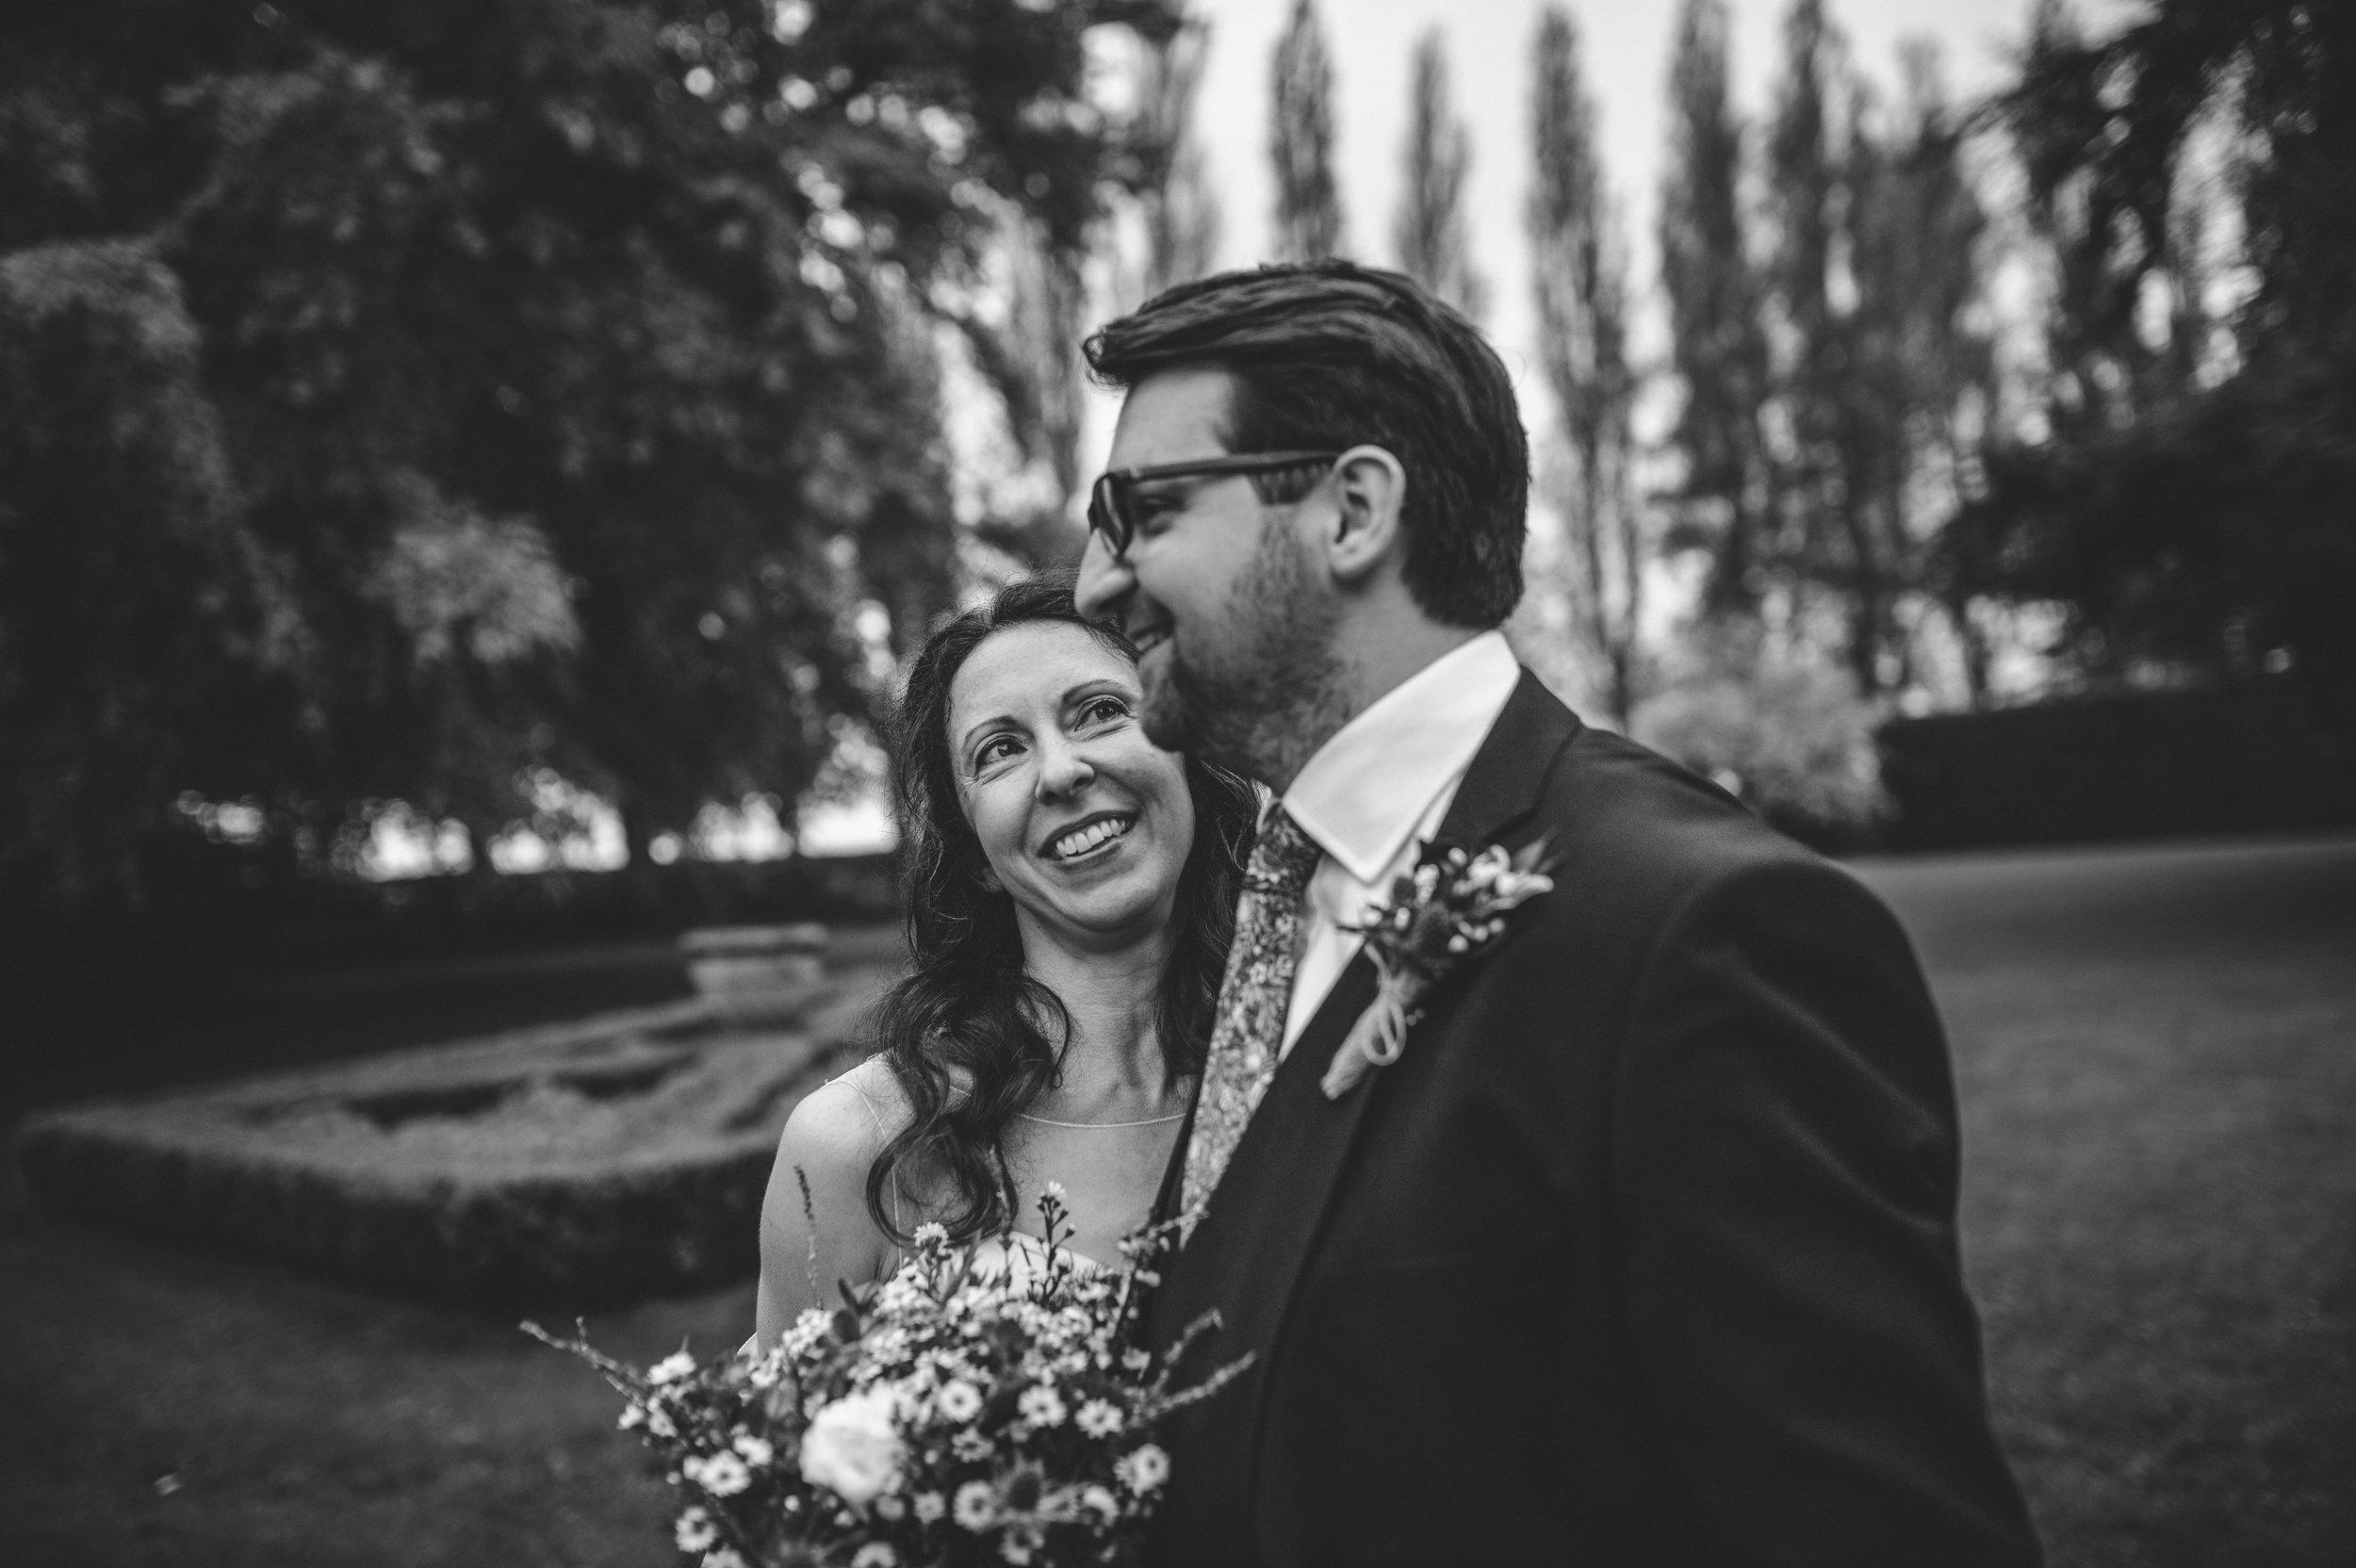 Beechfield house weddings - Abby and Greg (185 of 208).jpg